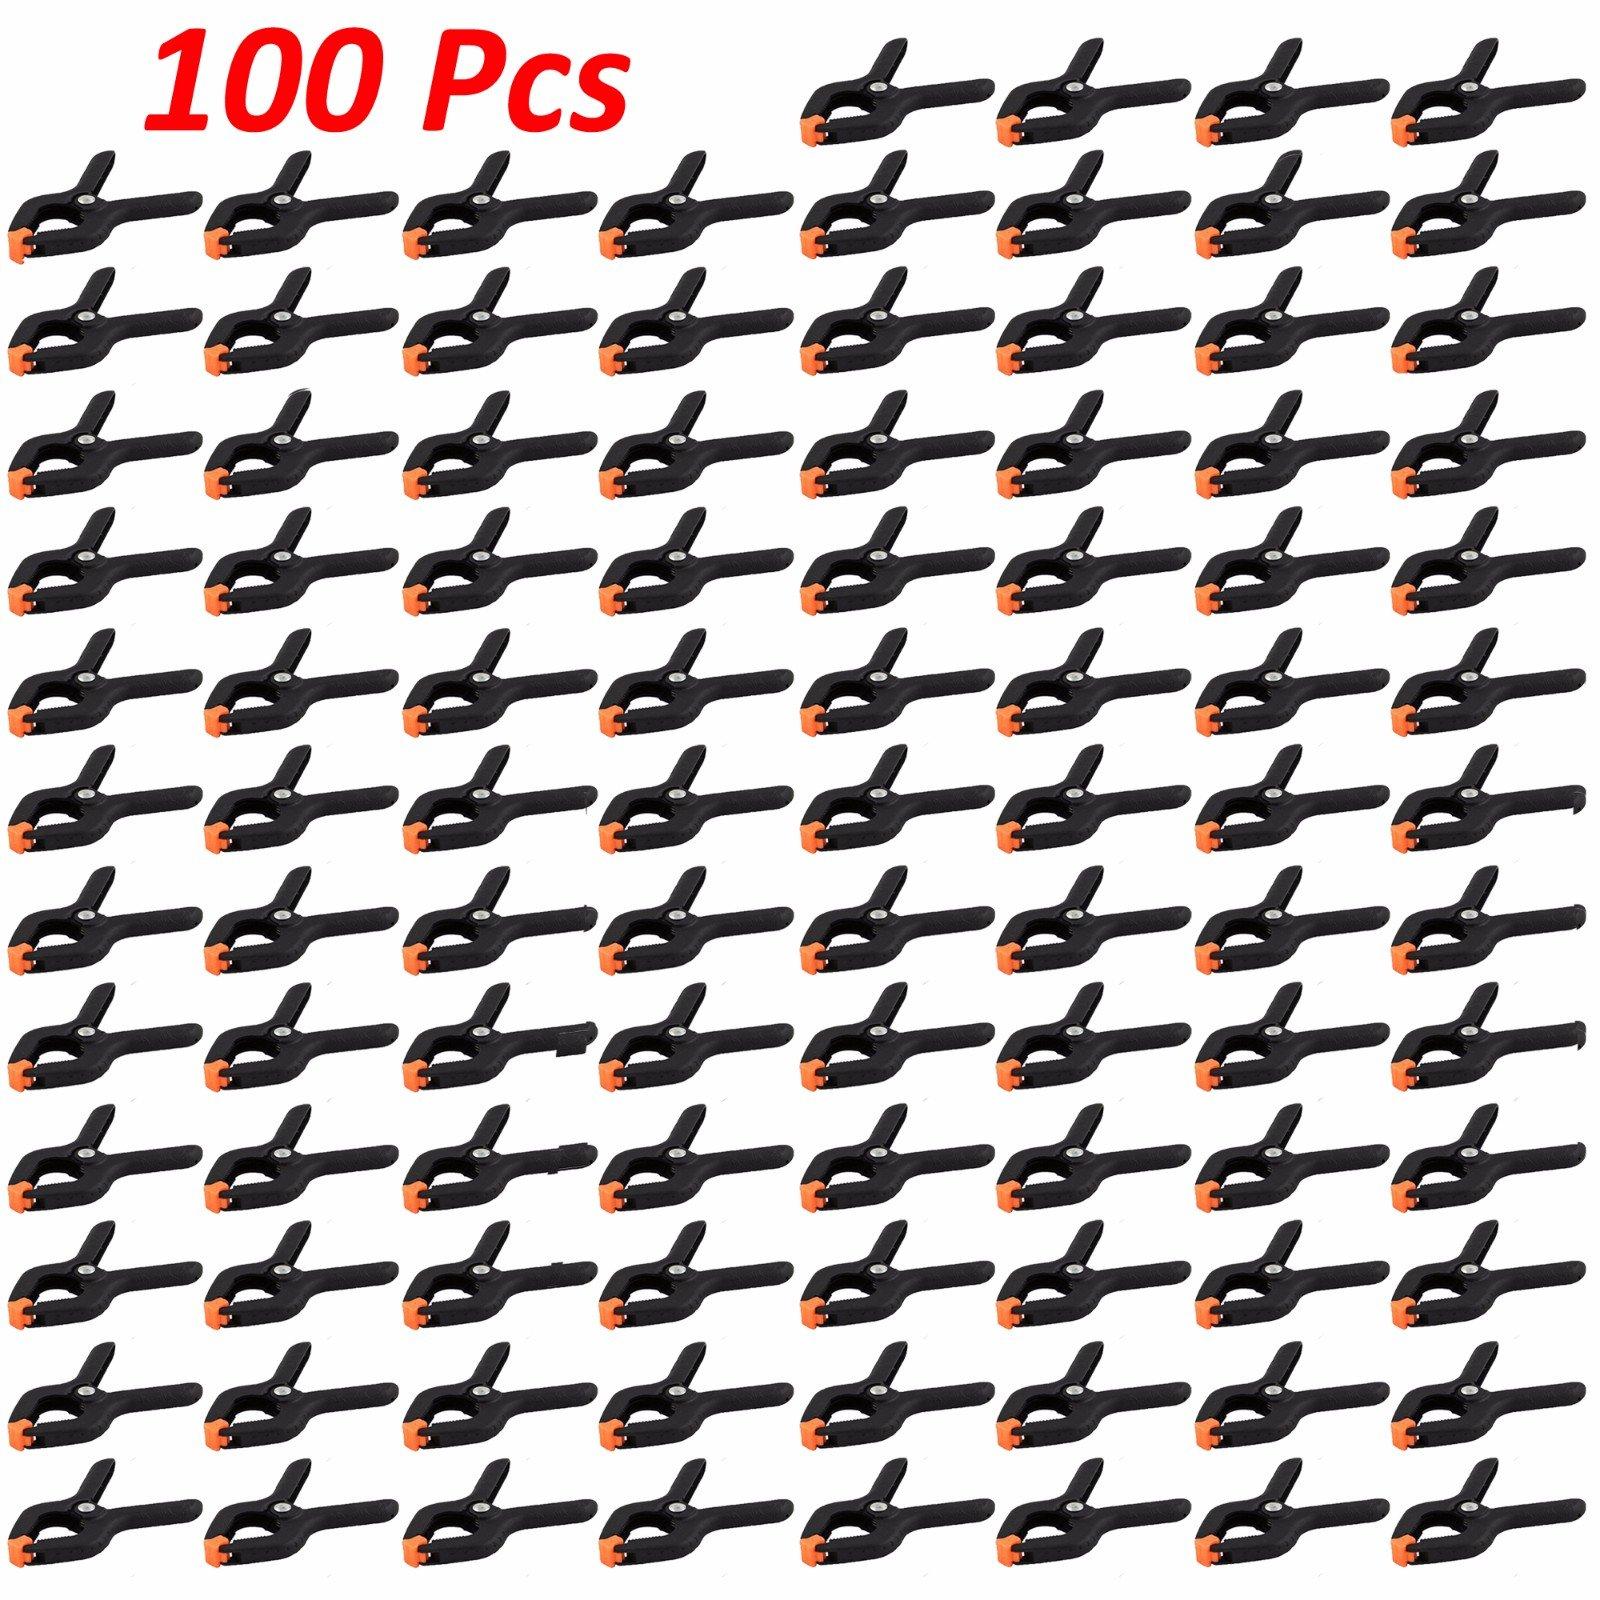 Wideskall 2.7'' inch Mini Nylon Plastic Spring Clamps - Pack of 100